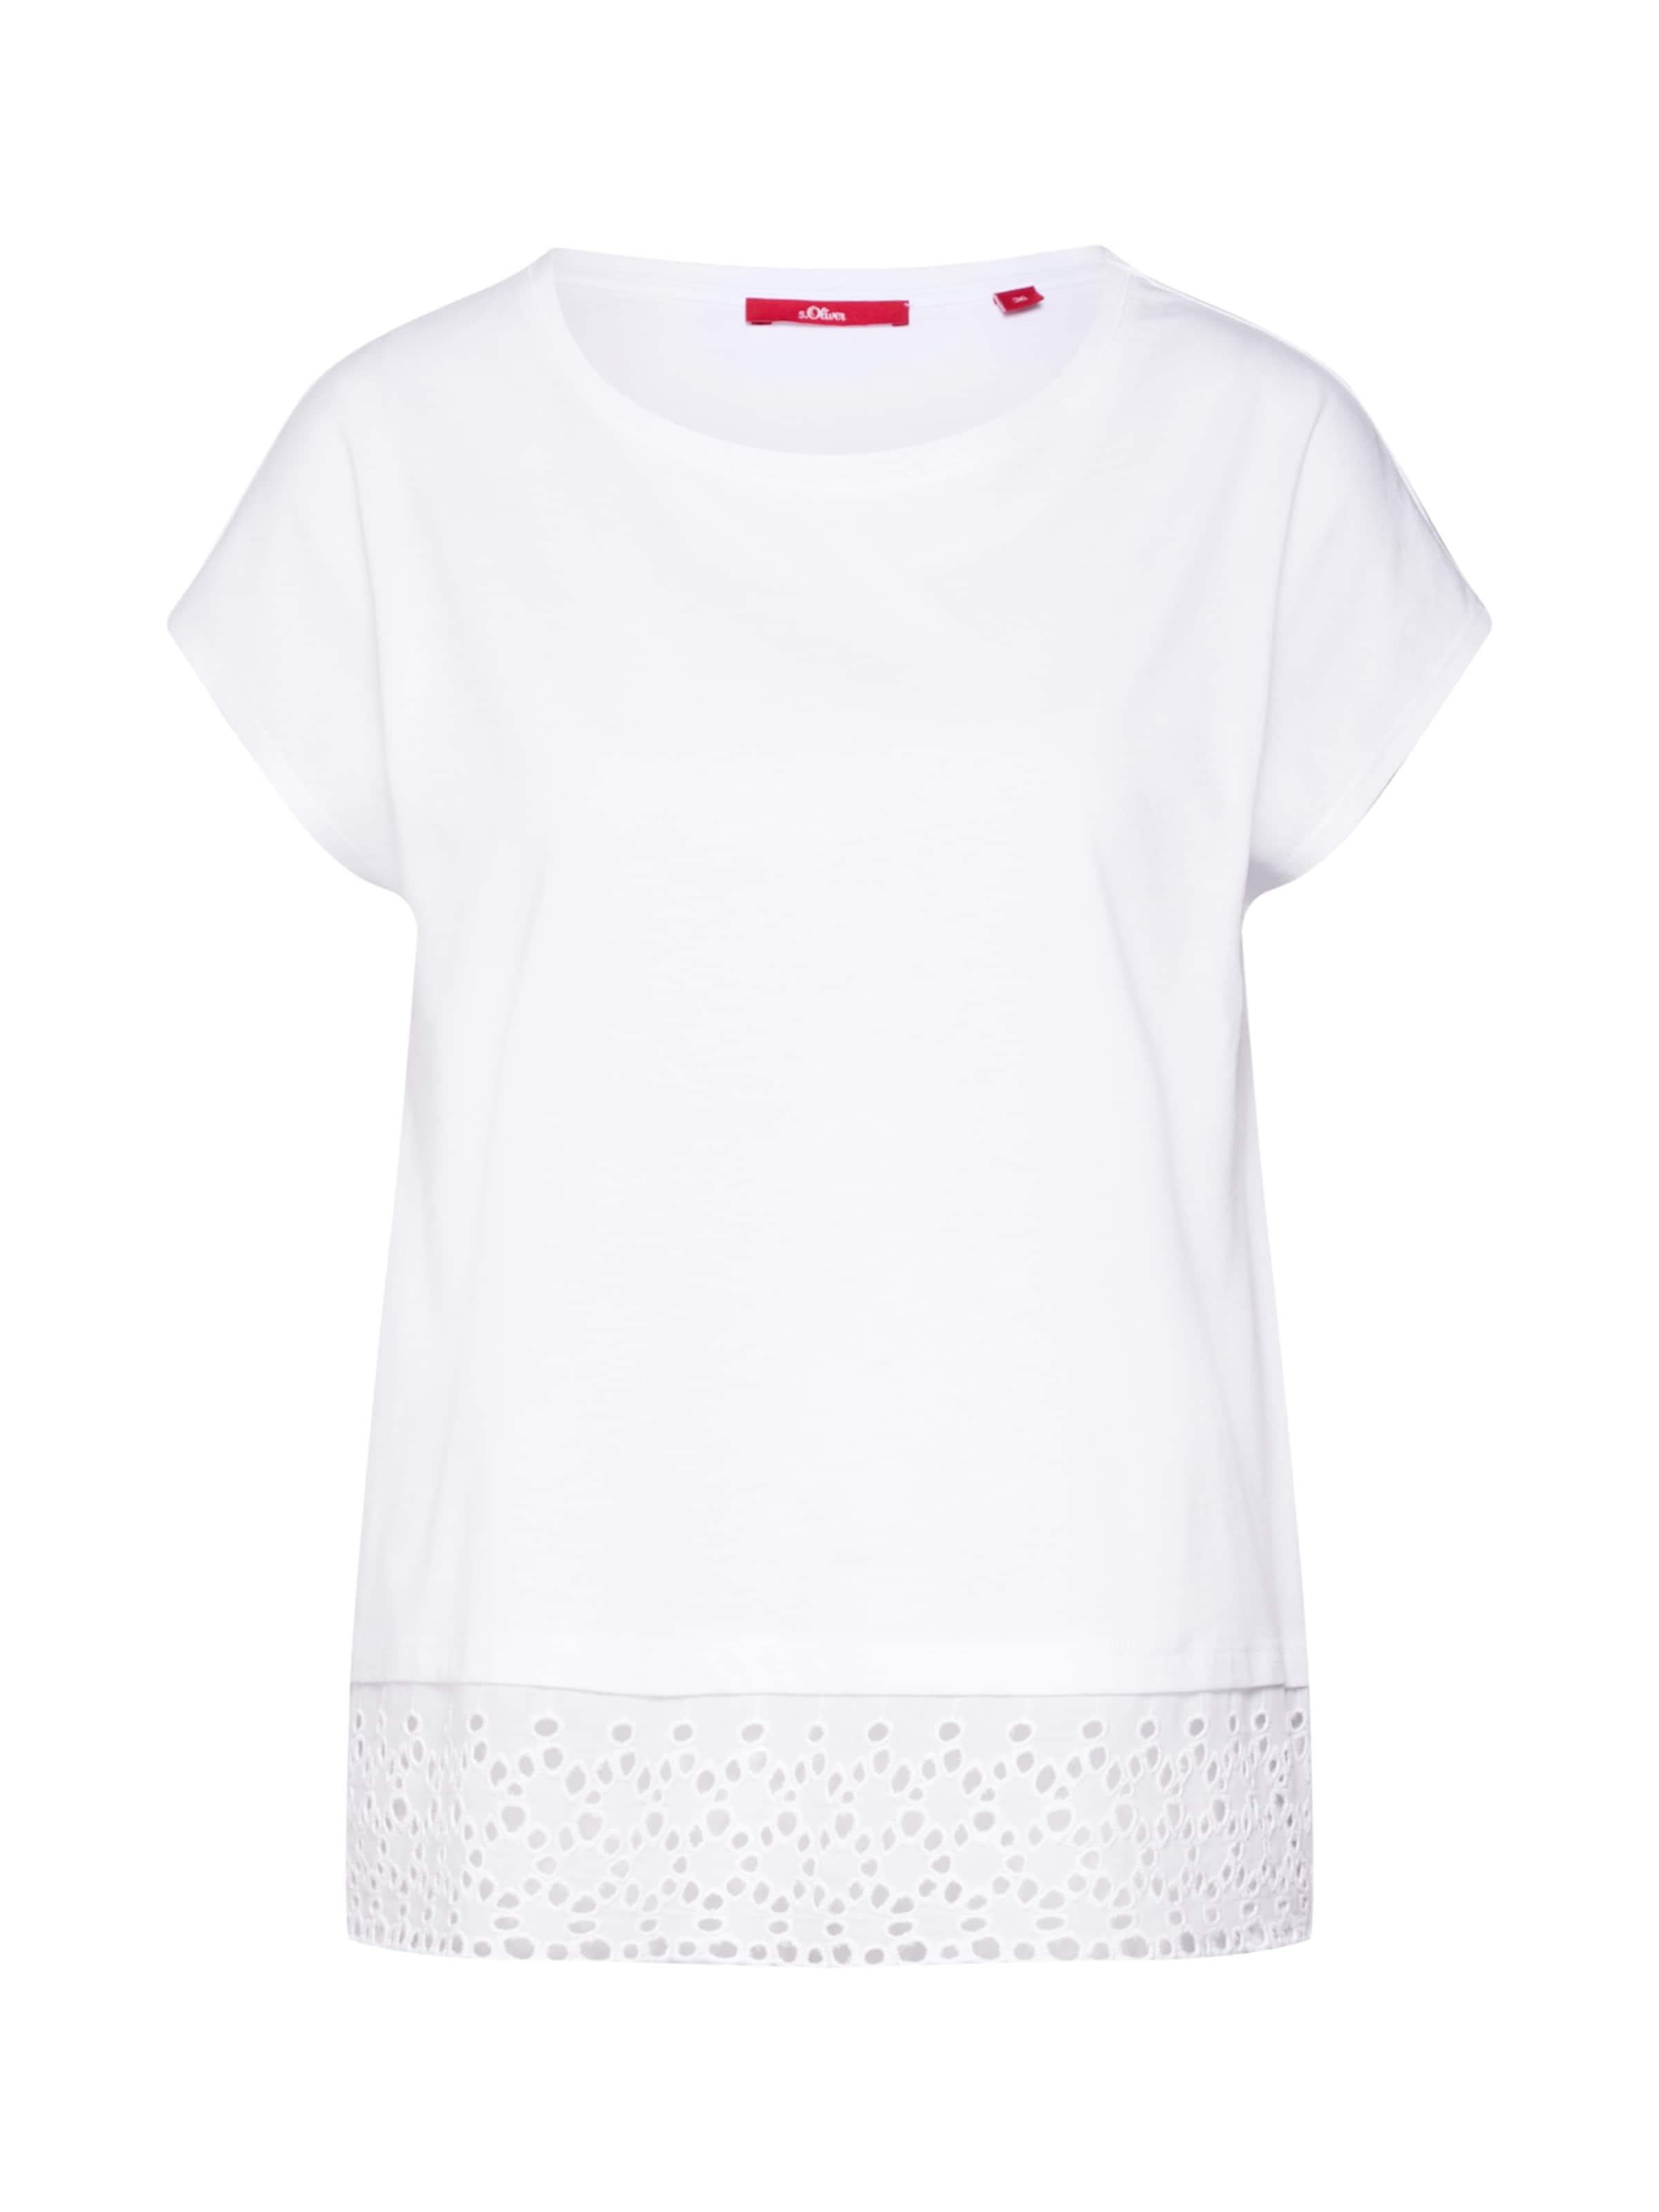 oliver In S Red Label Jerseyshirt Weiß lKu1TFJc3